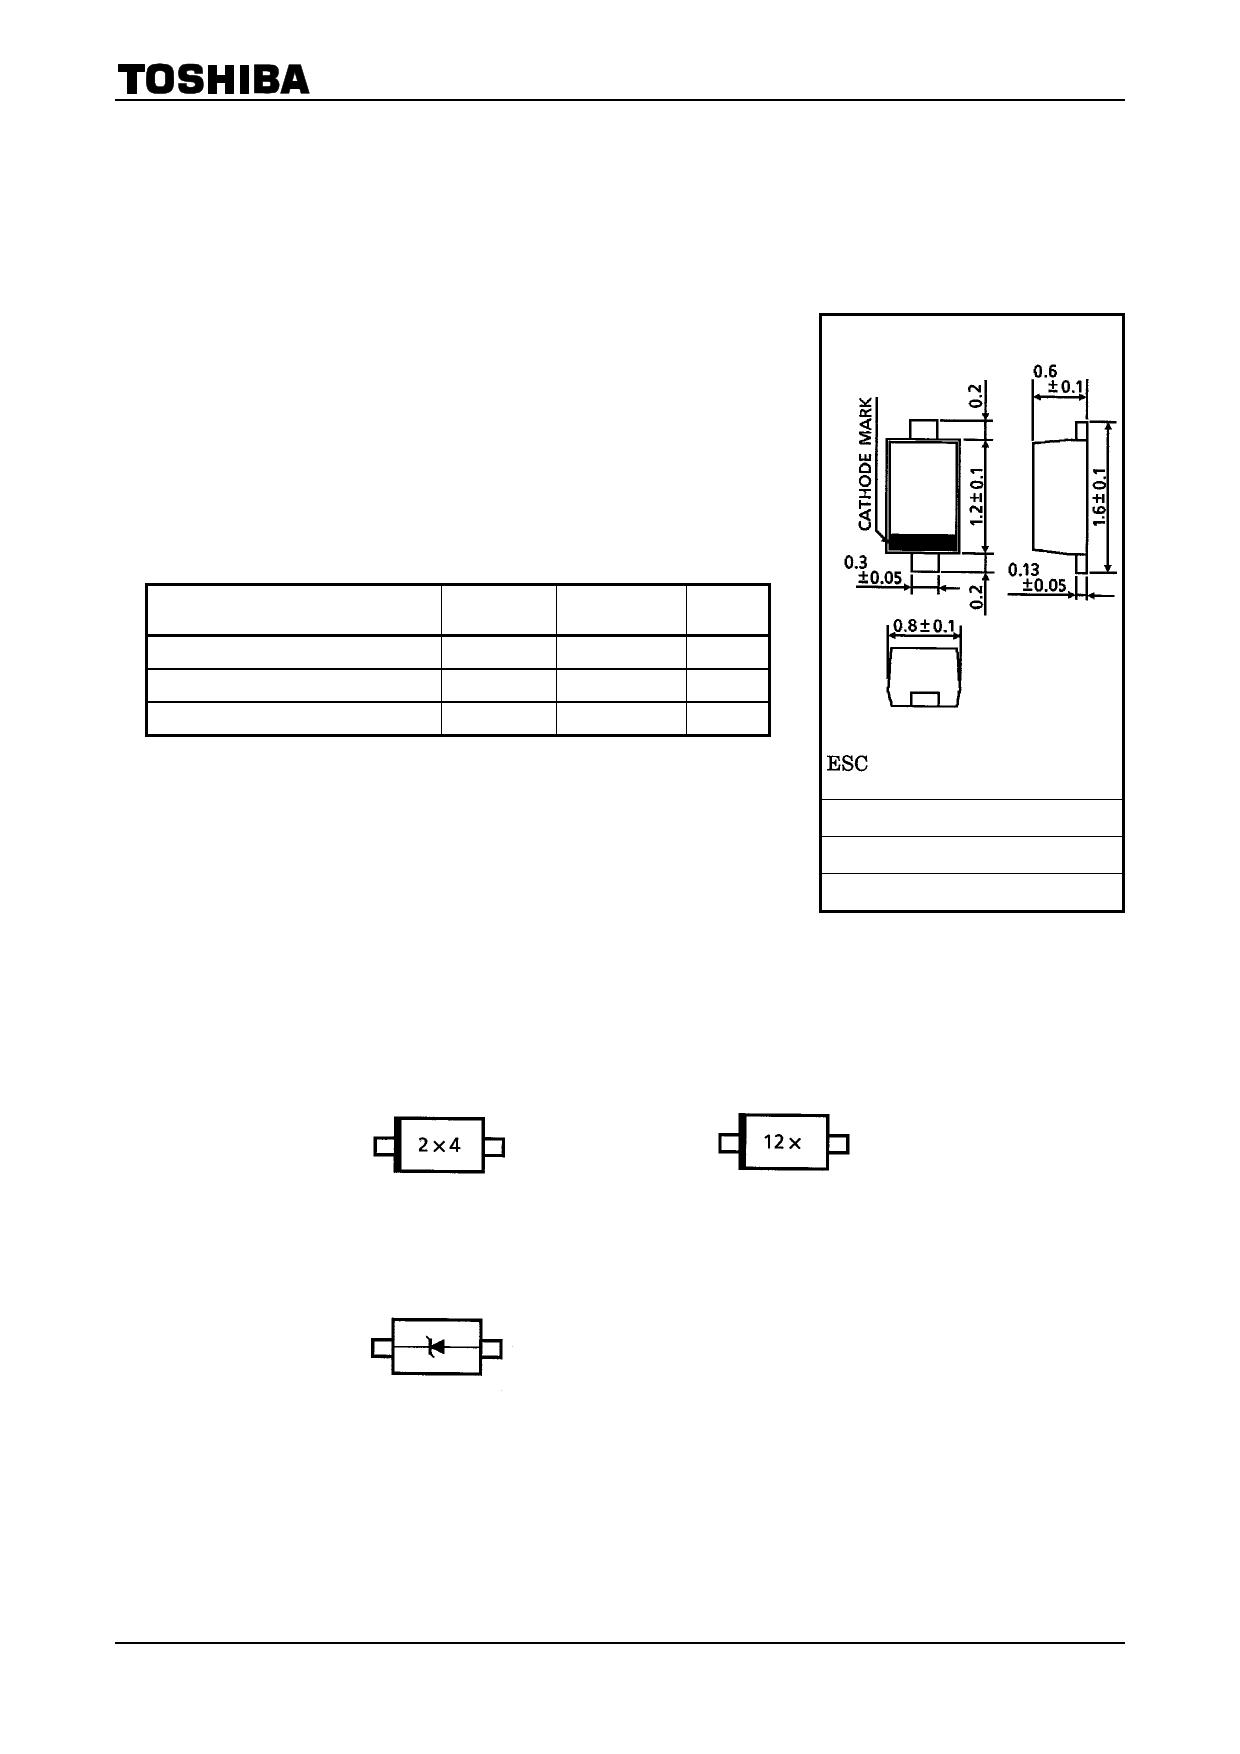 015AZ2.4 datasheet